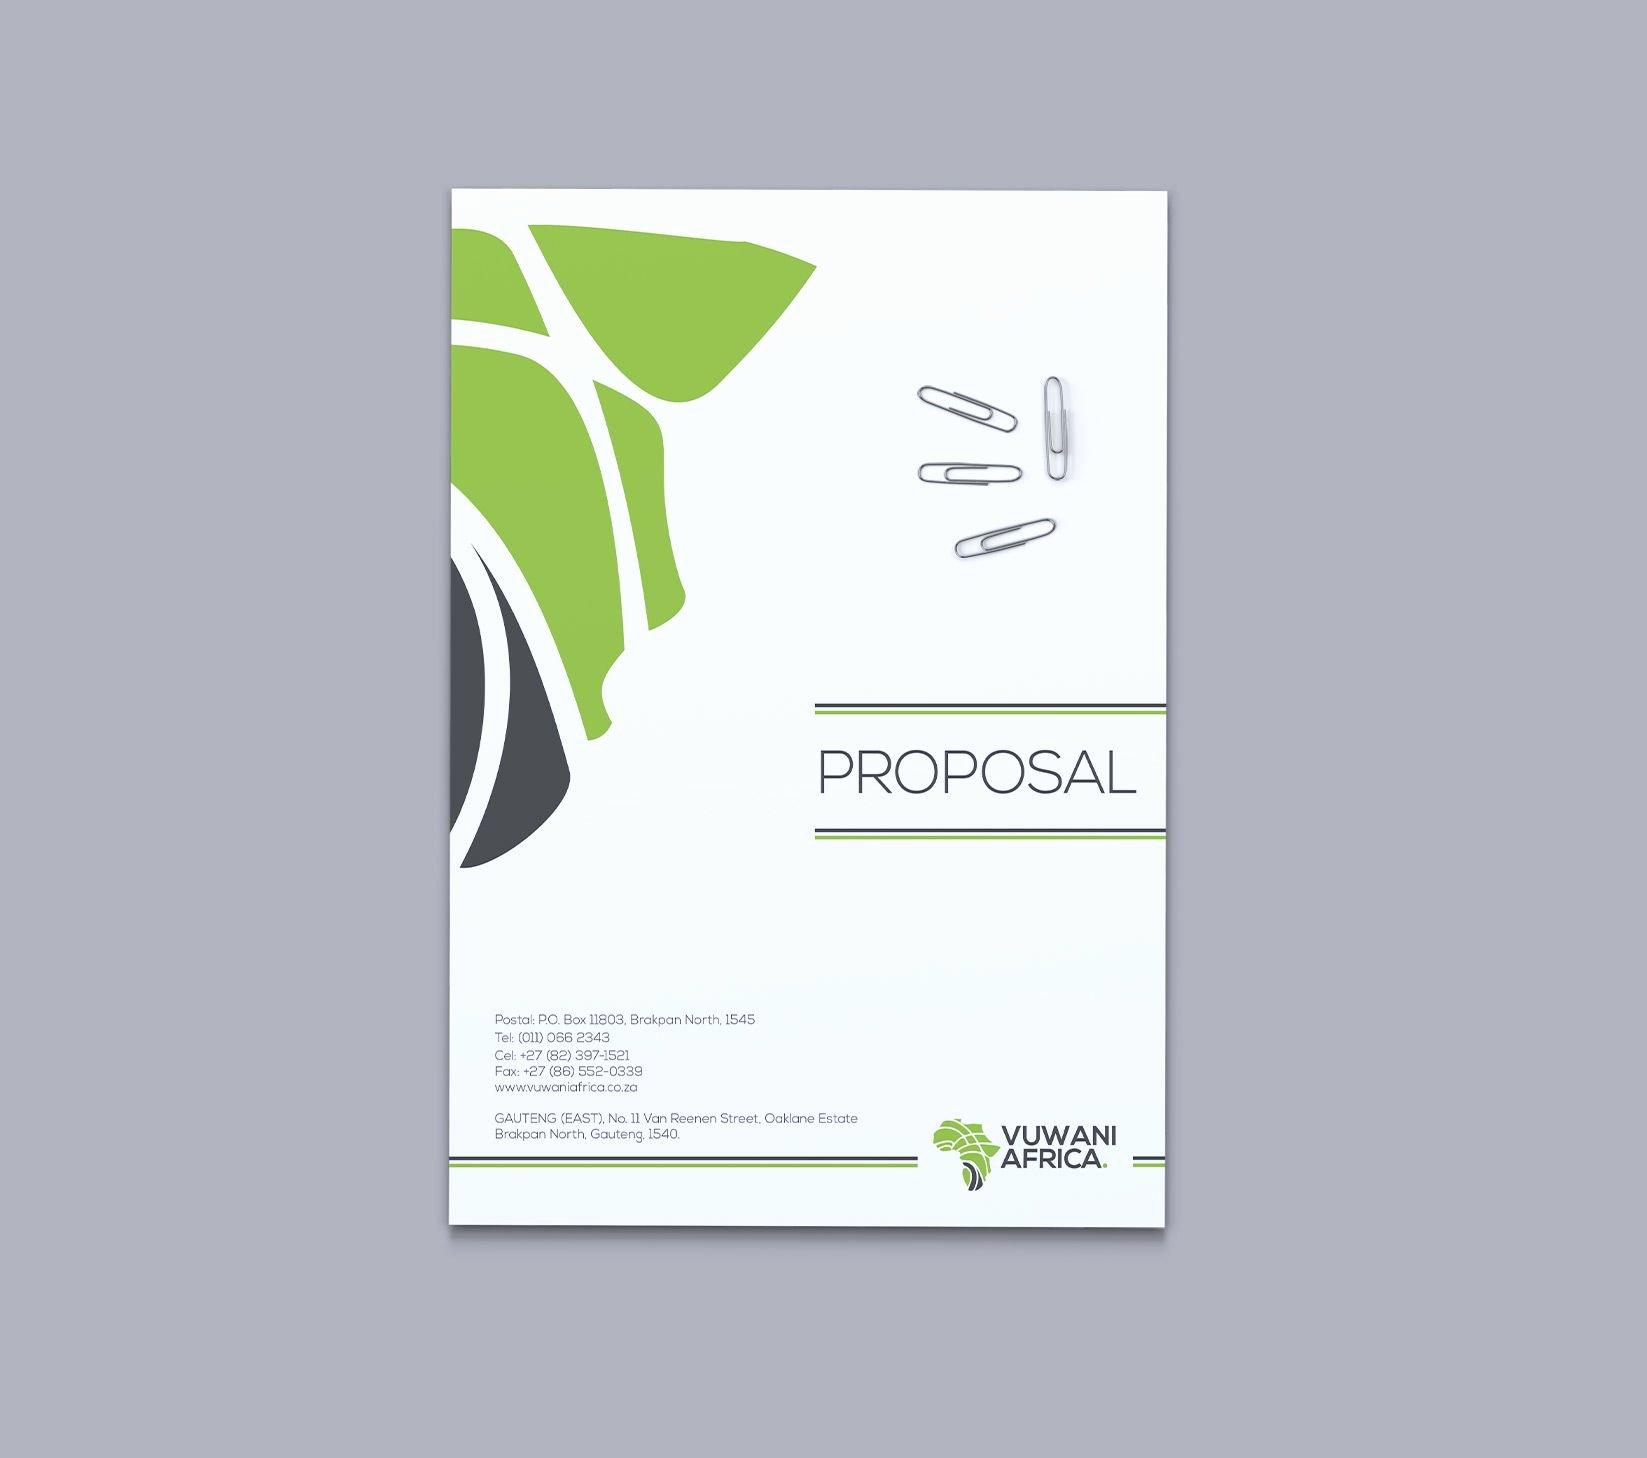 Proposal Cover Designs Google Search